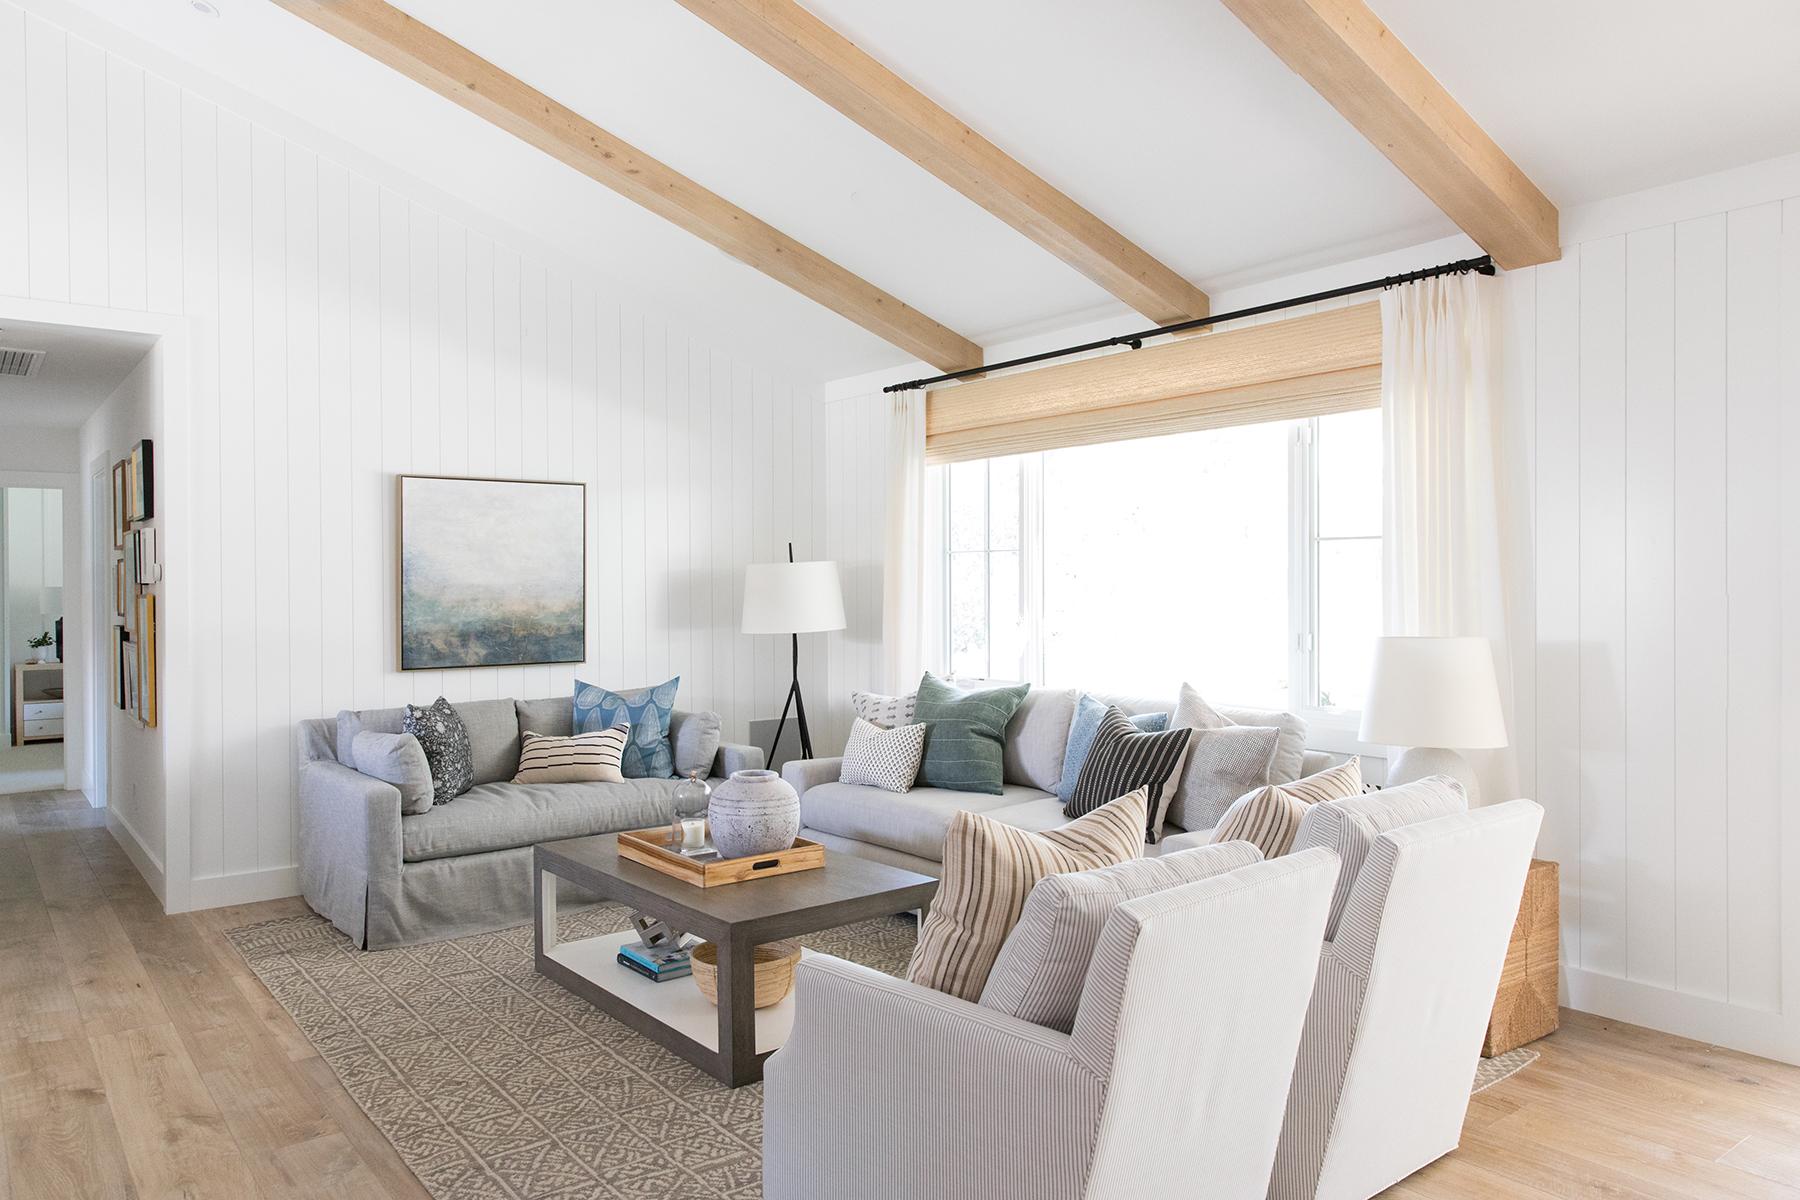 Moody Coastal Living Room with exposed beams - Studio McGee.jpg